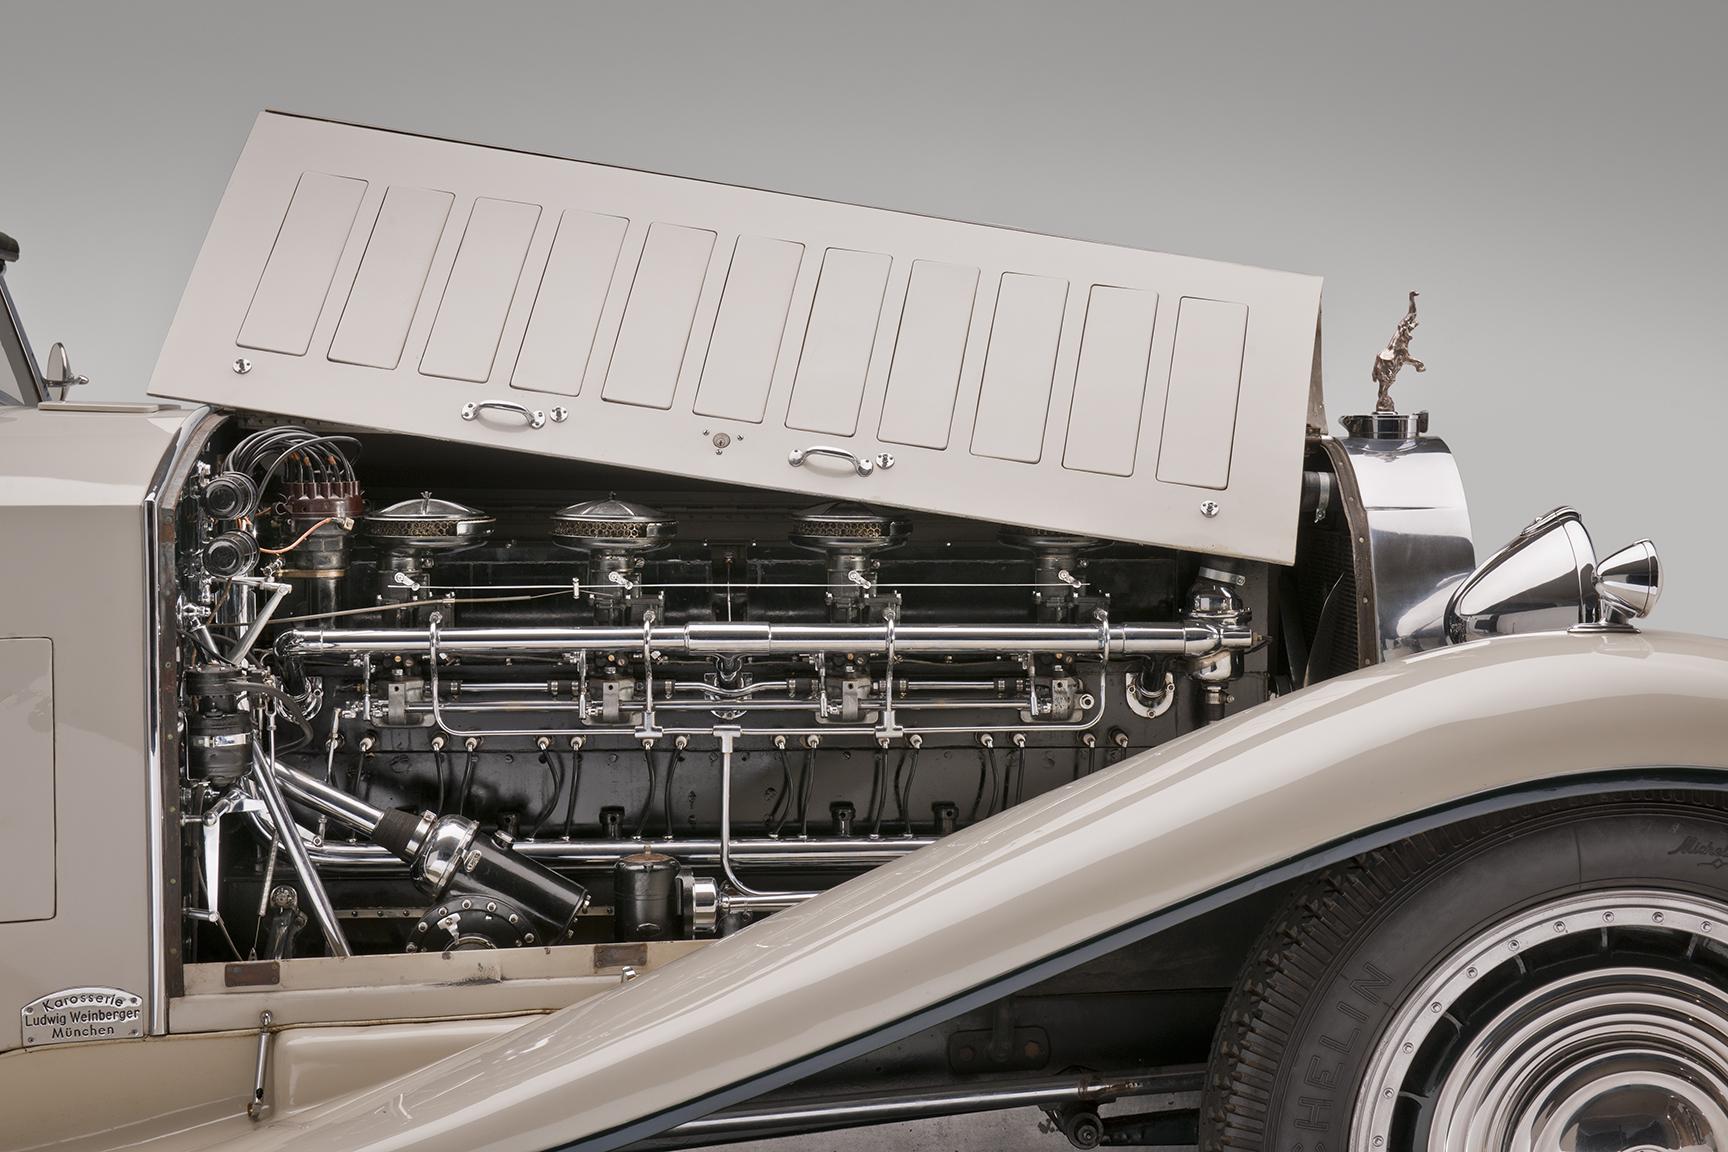 1931 Bugatti Type 41 Royale engine